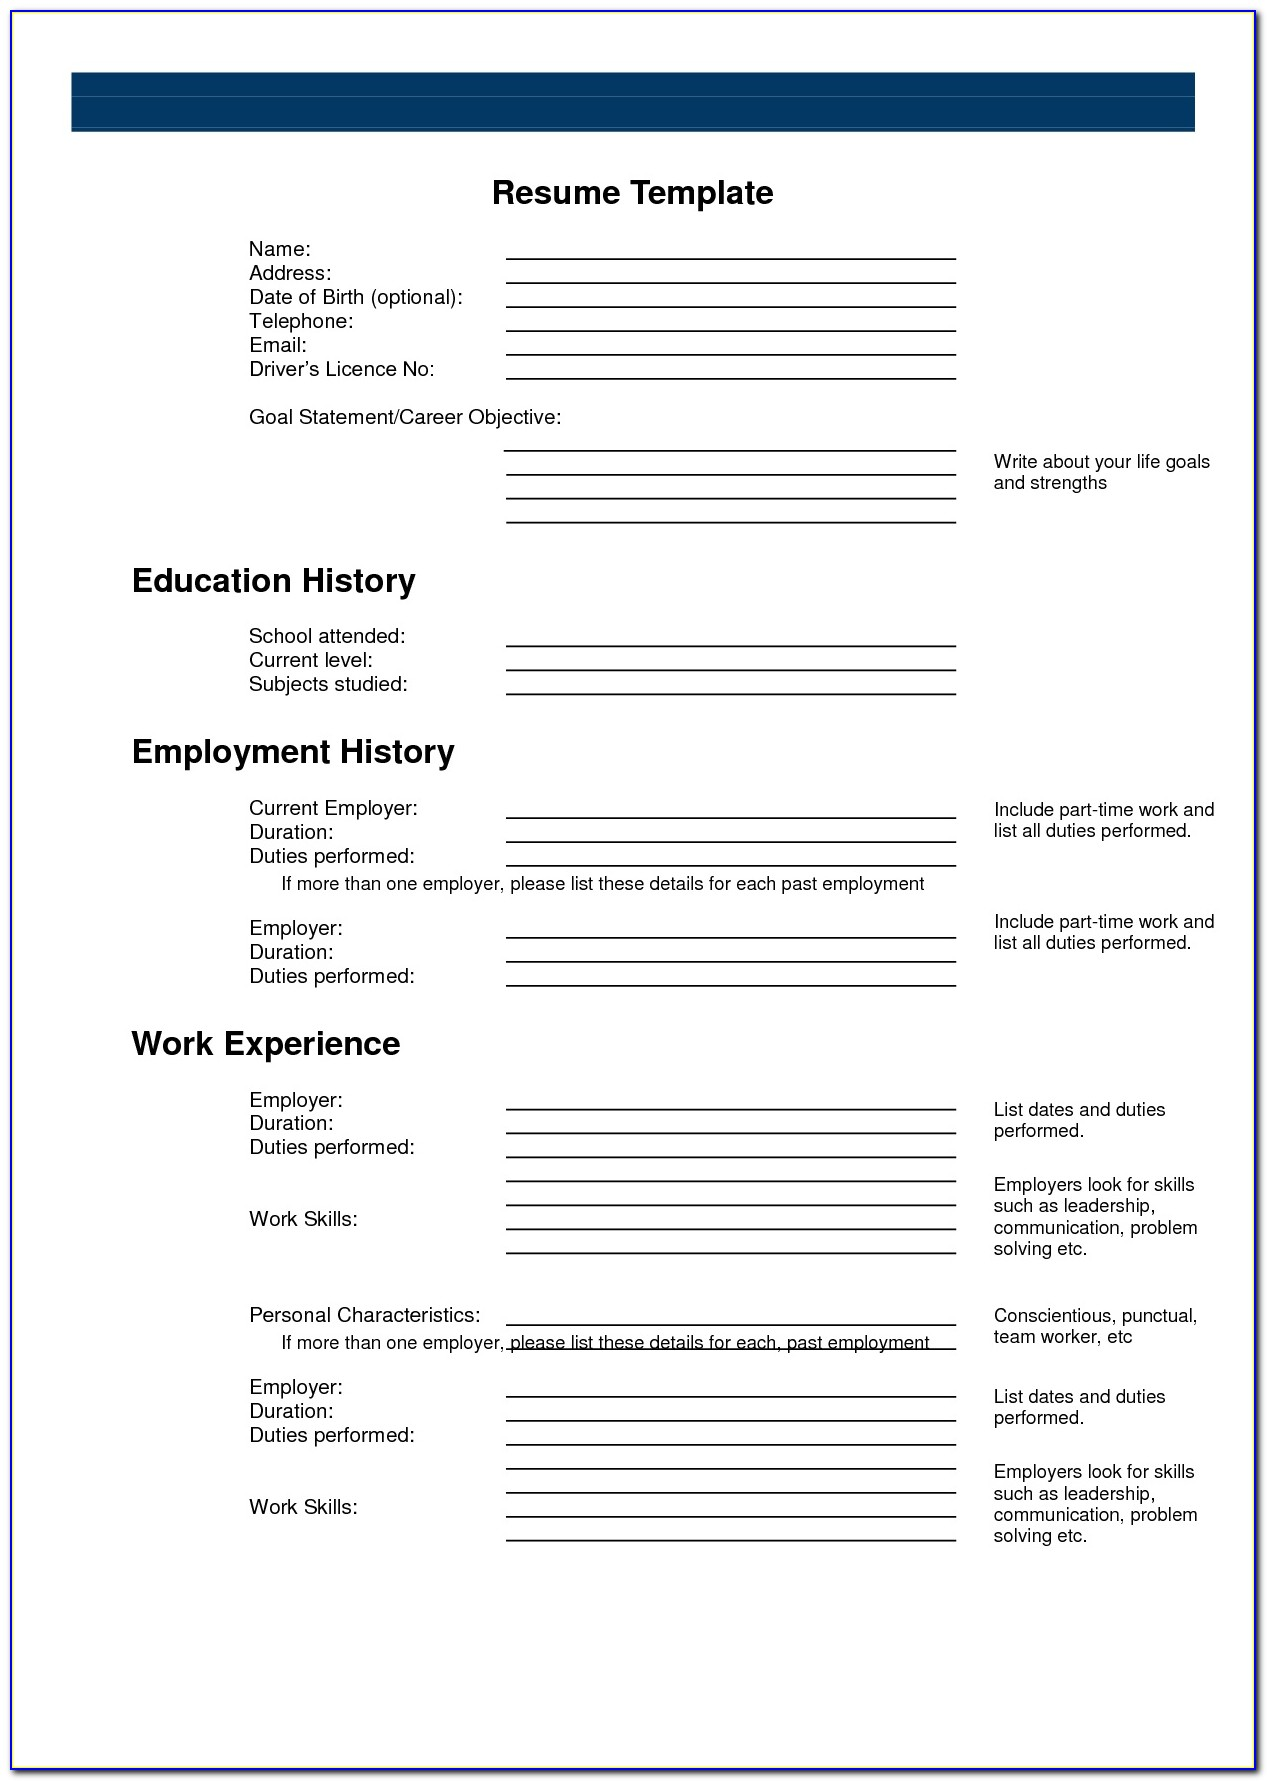 Free Printable Resume Template 2018